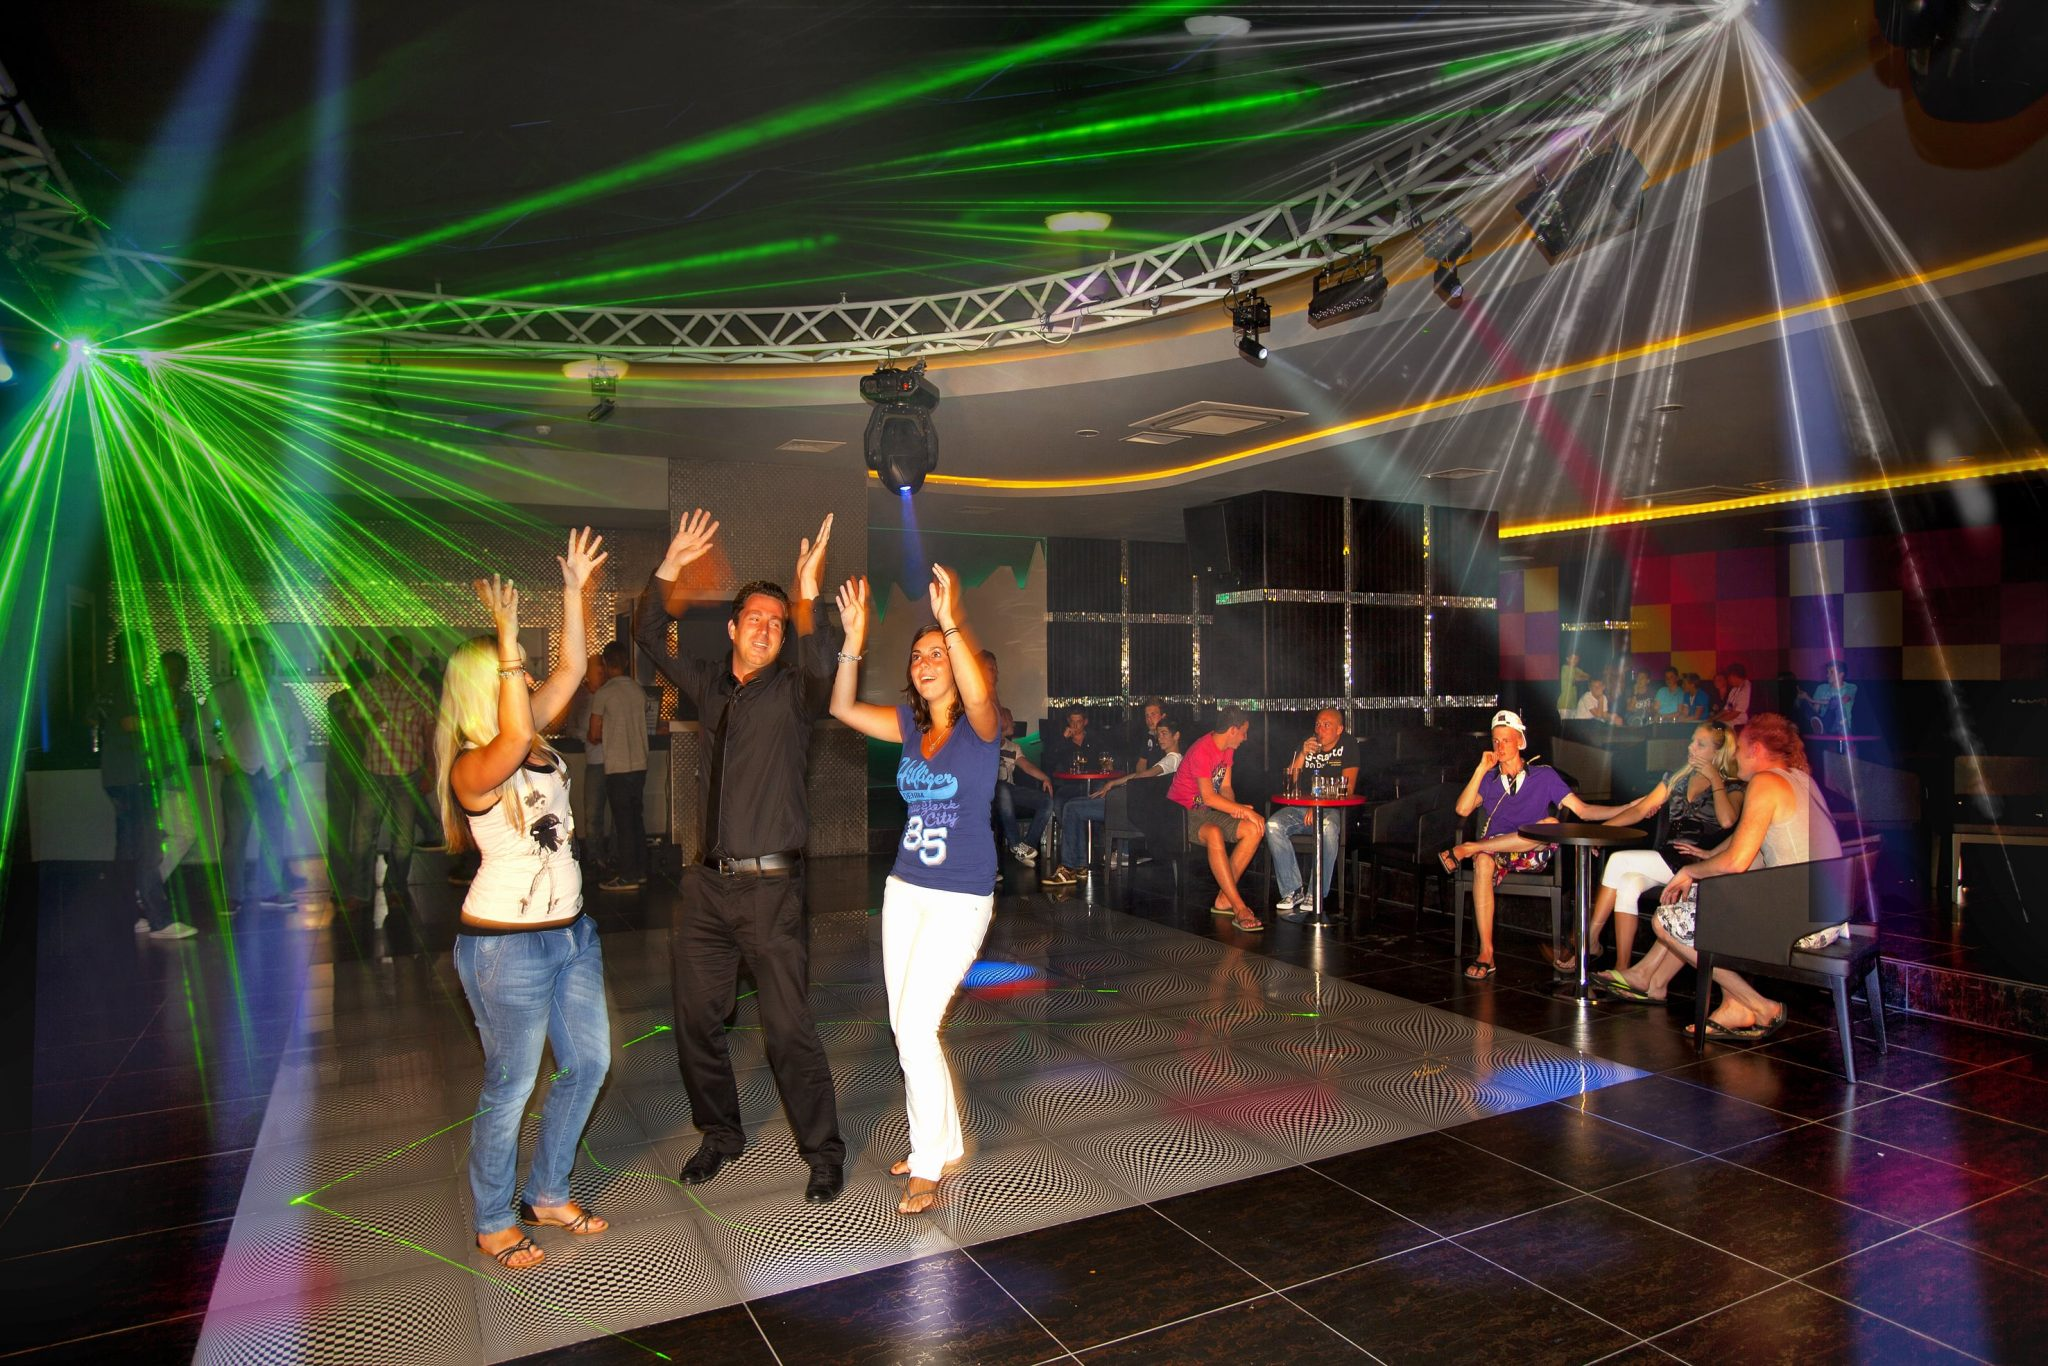 Letovanje_Turska_Hoteli_Avio_Antalija_Hotel_Royal_Holiday_Palace-32-scaled.jpg